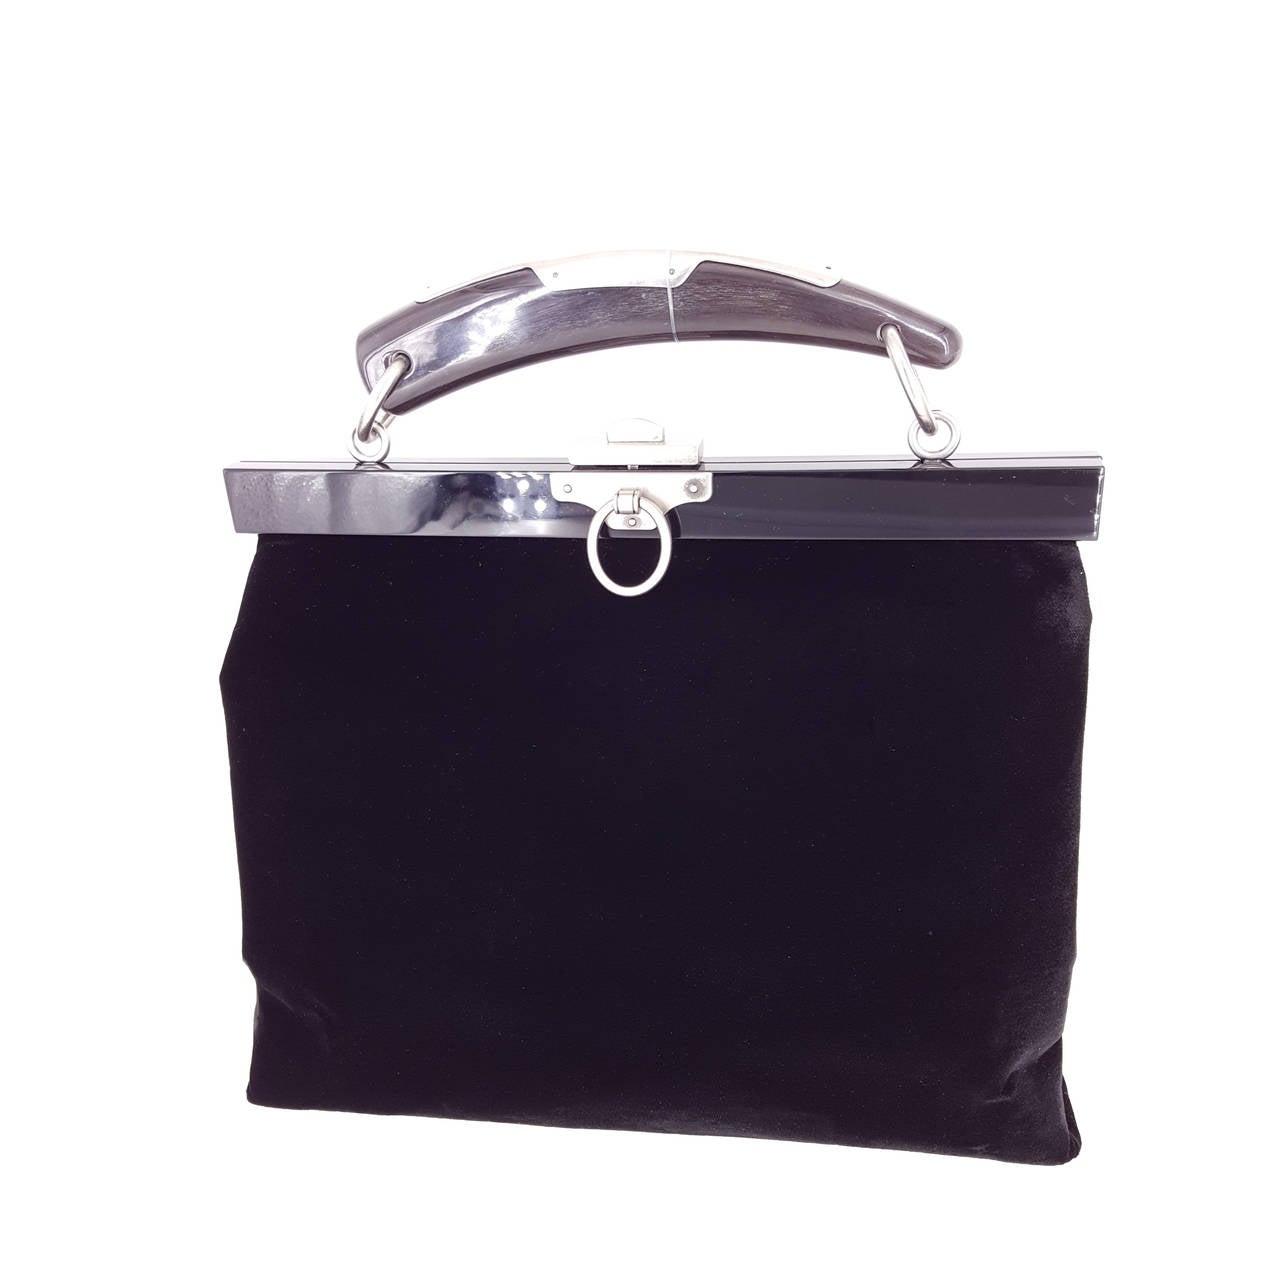 New Acura Dealership In Delray Beach Fl 33483: YSL Limited Edition Black Velvet Mombasa Handbag With